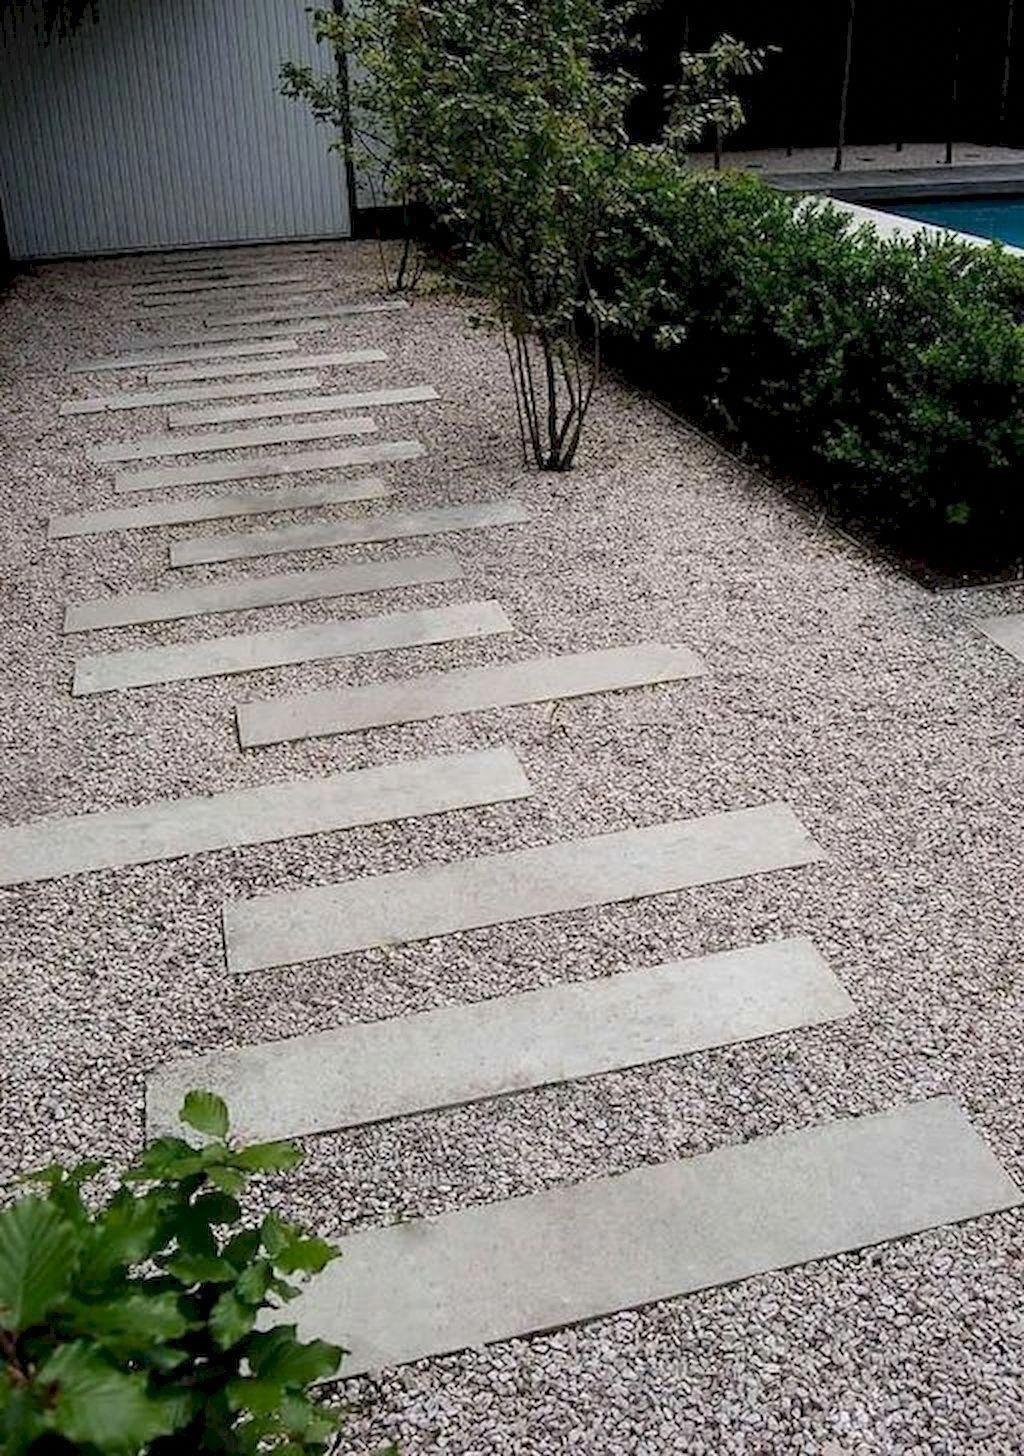 Landscape Gardening Free Design Gardening And Landscape Design Business Diploma Course Landscapegardeningwikipedia Tuin Ideeen Kiezel Tuin Tuin Bestrating